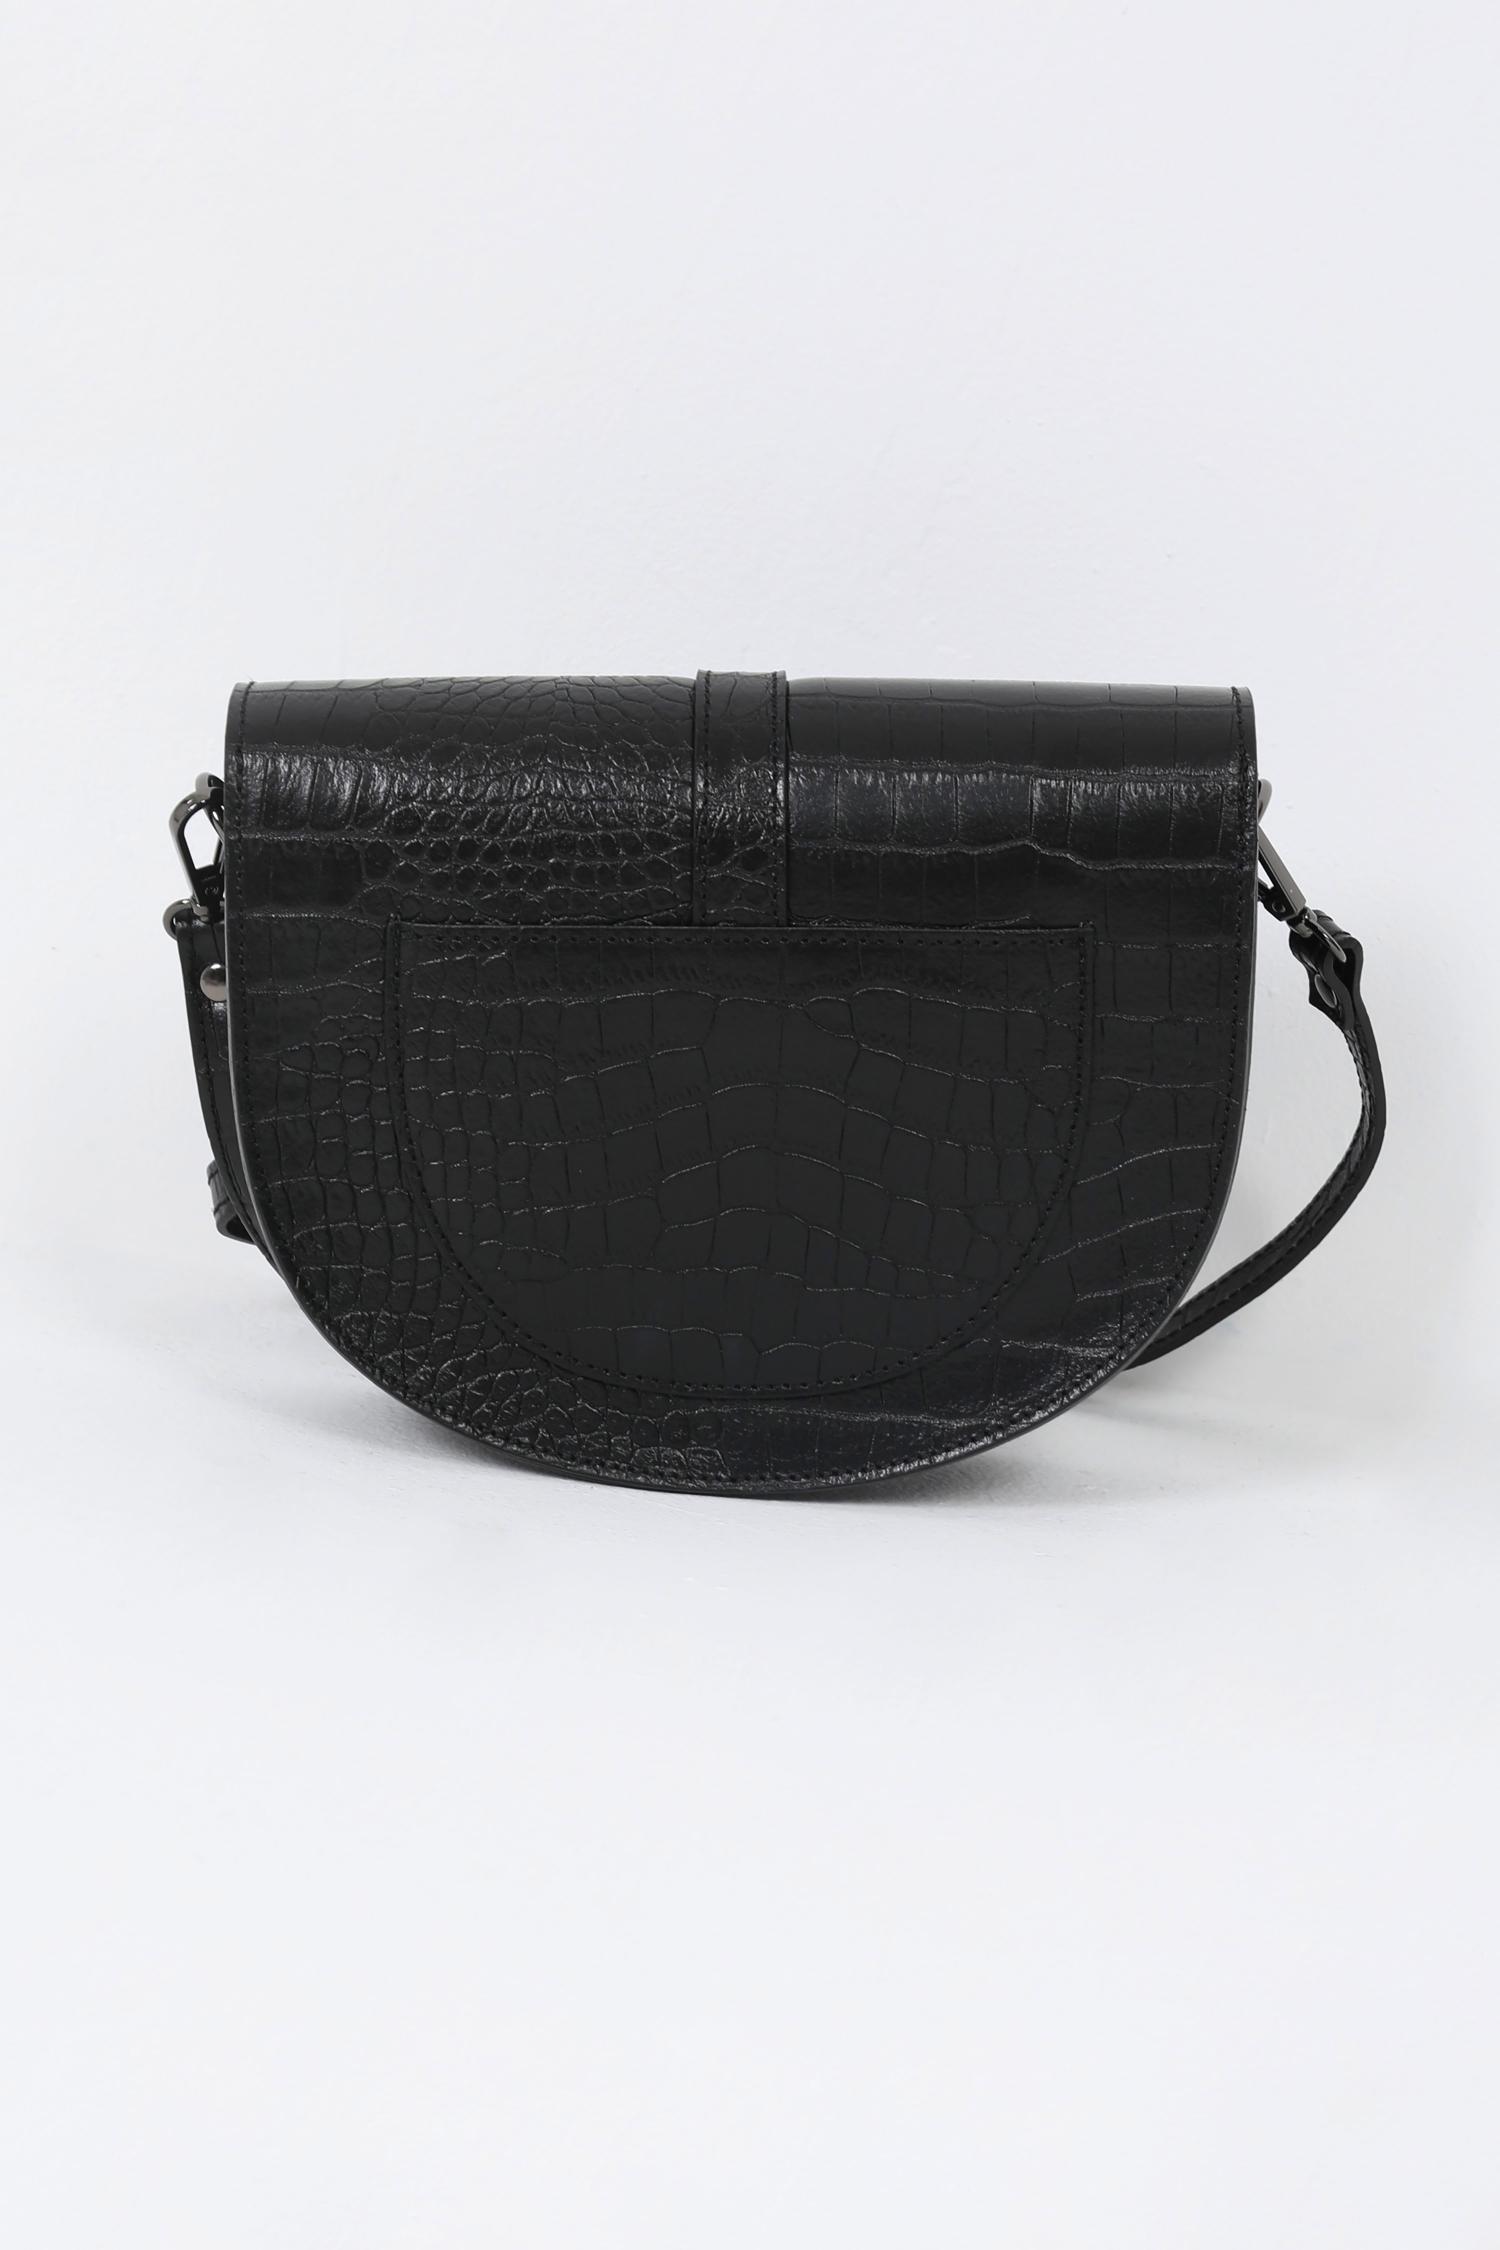 Half moon leather bag